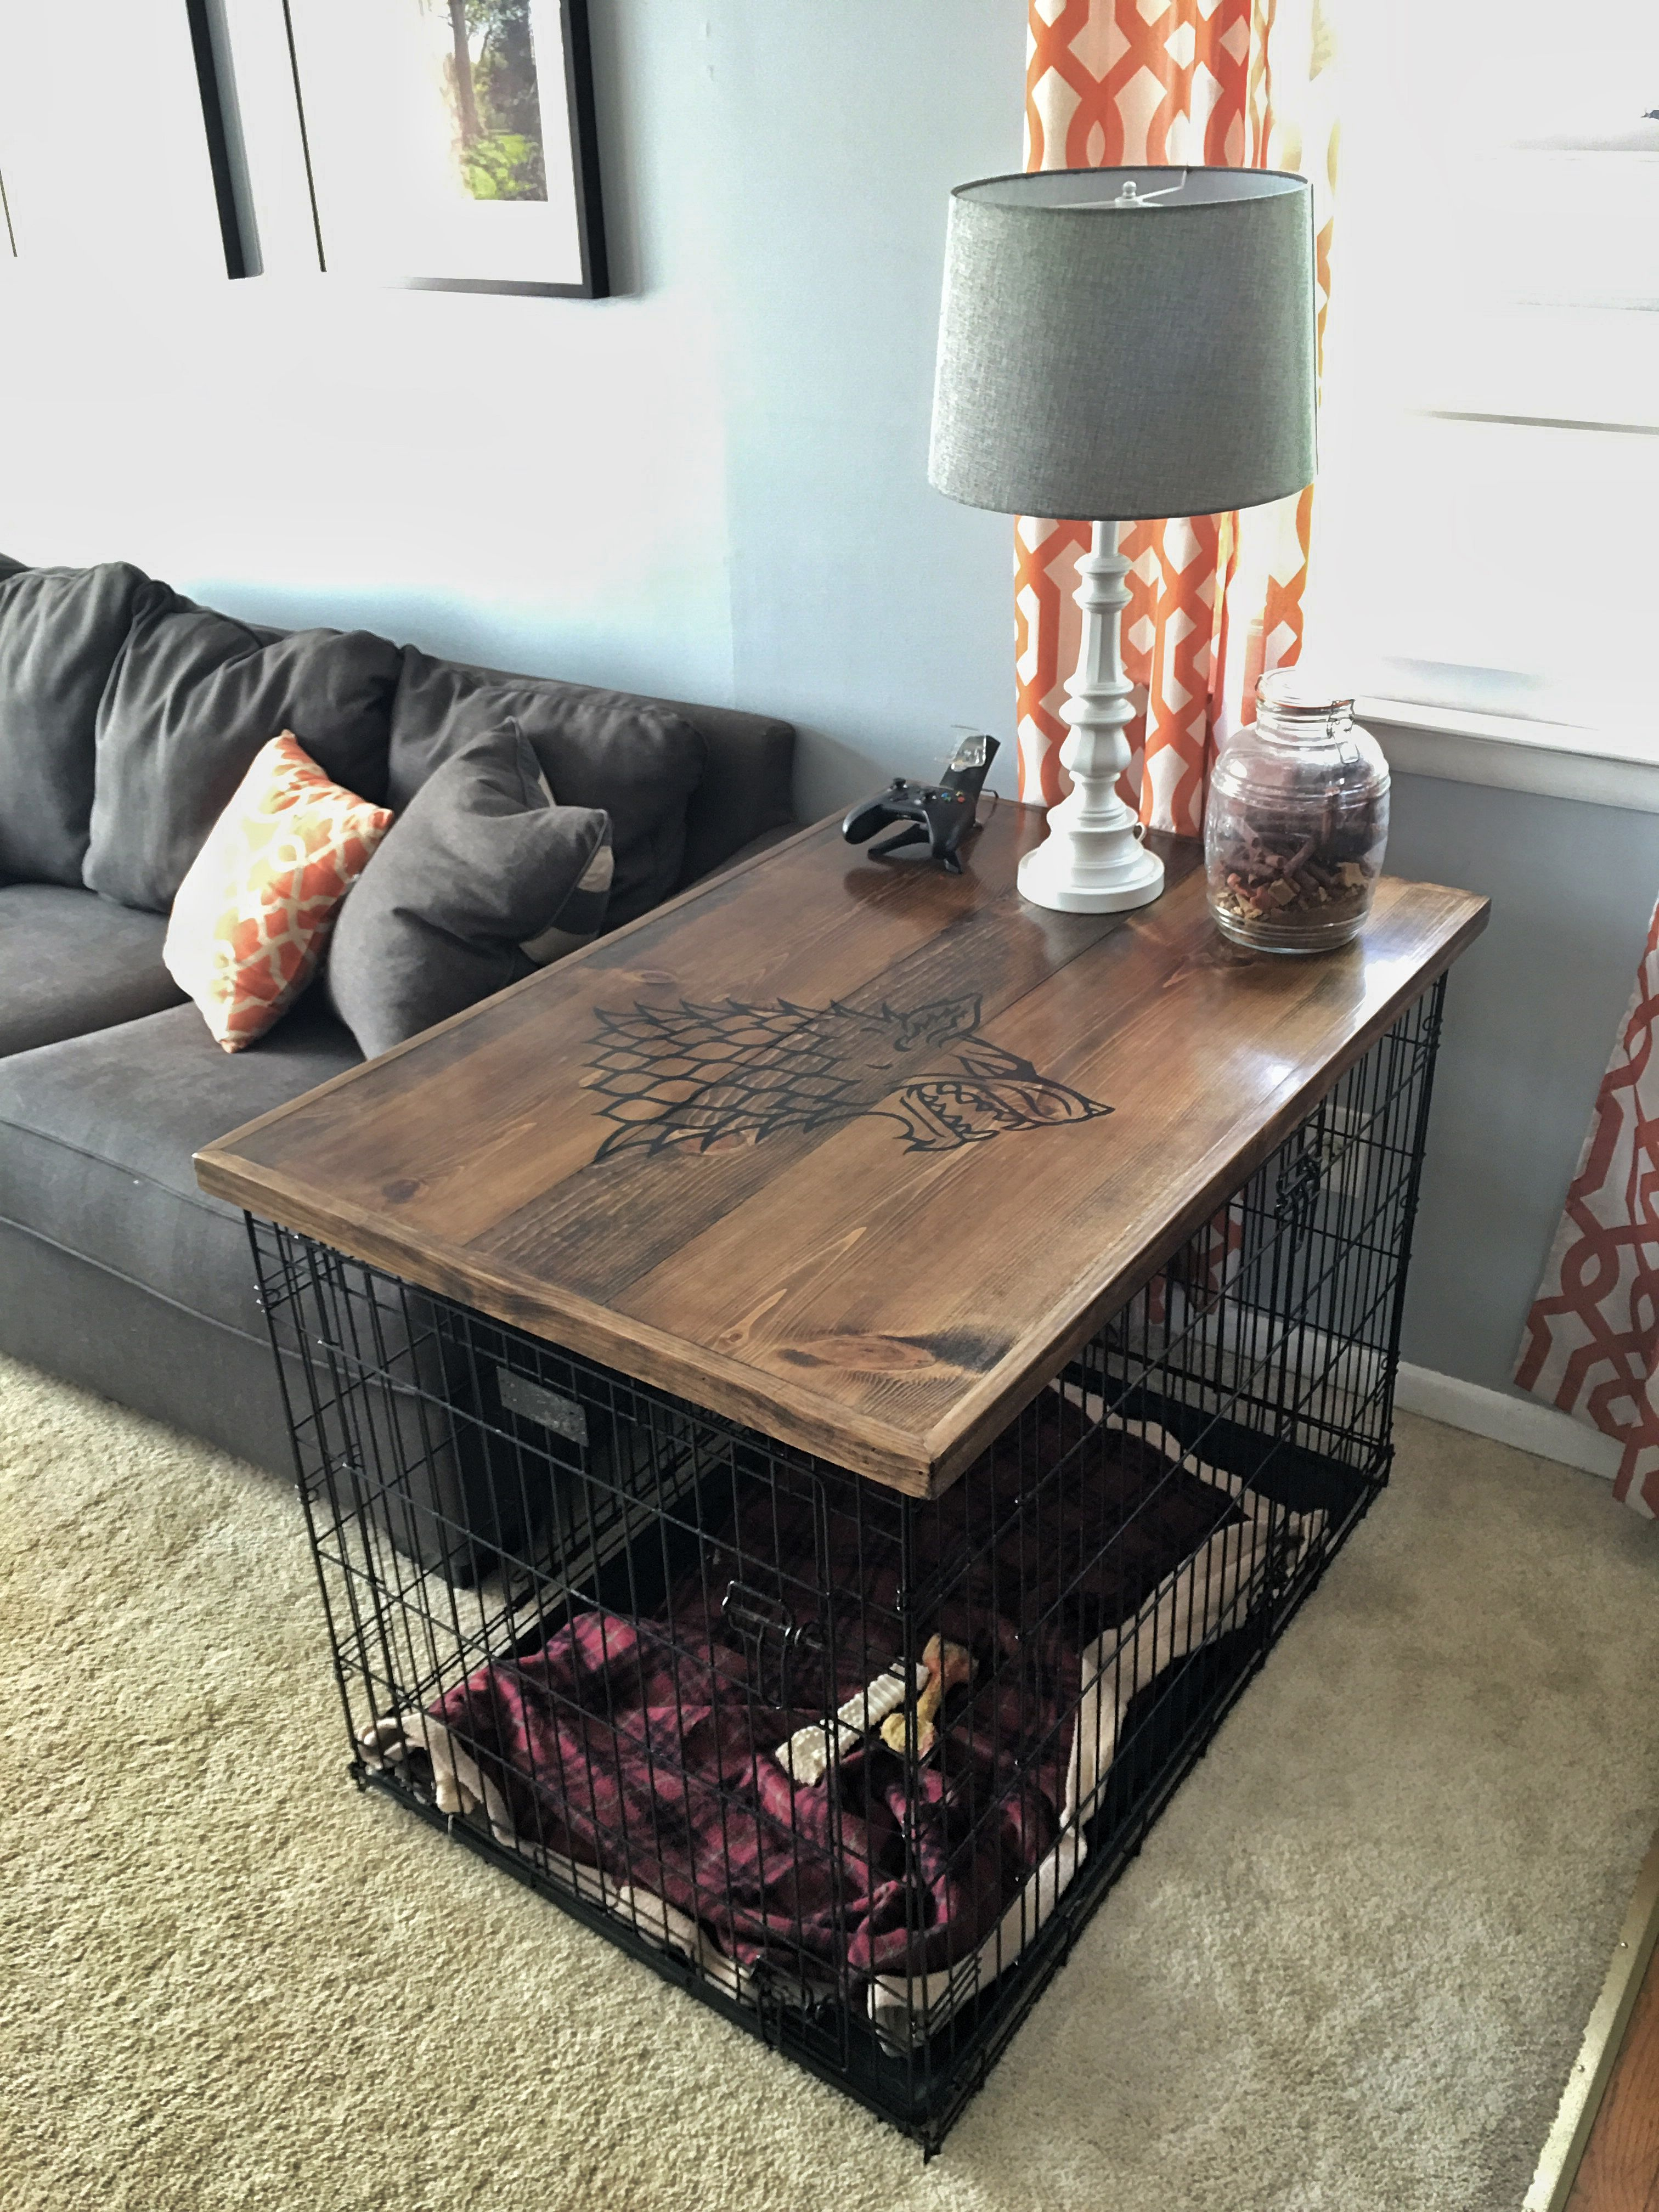 U0027Direwolfu0027 Dog Crate Table Top   Imgur